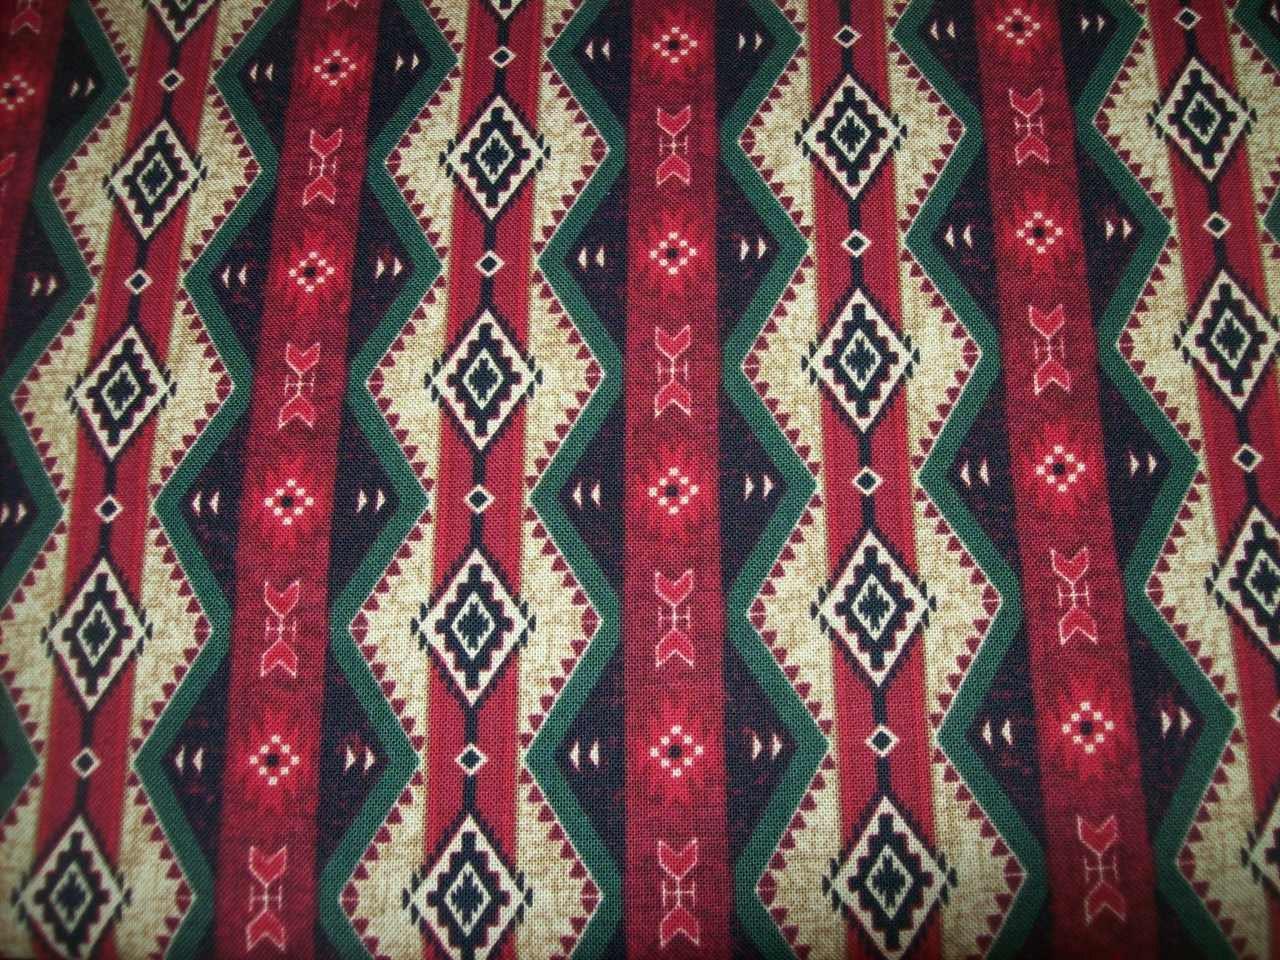 Red Timeless Treasures Aztec Tribal print fabric per yard/